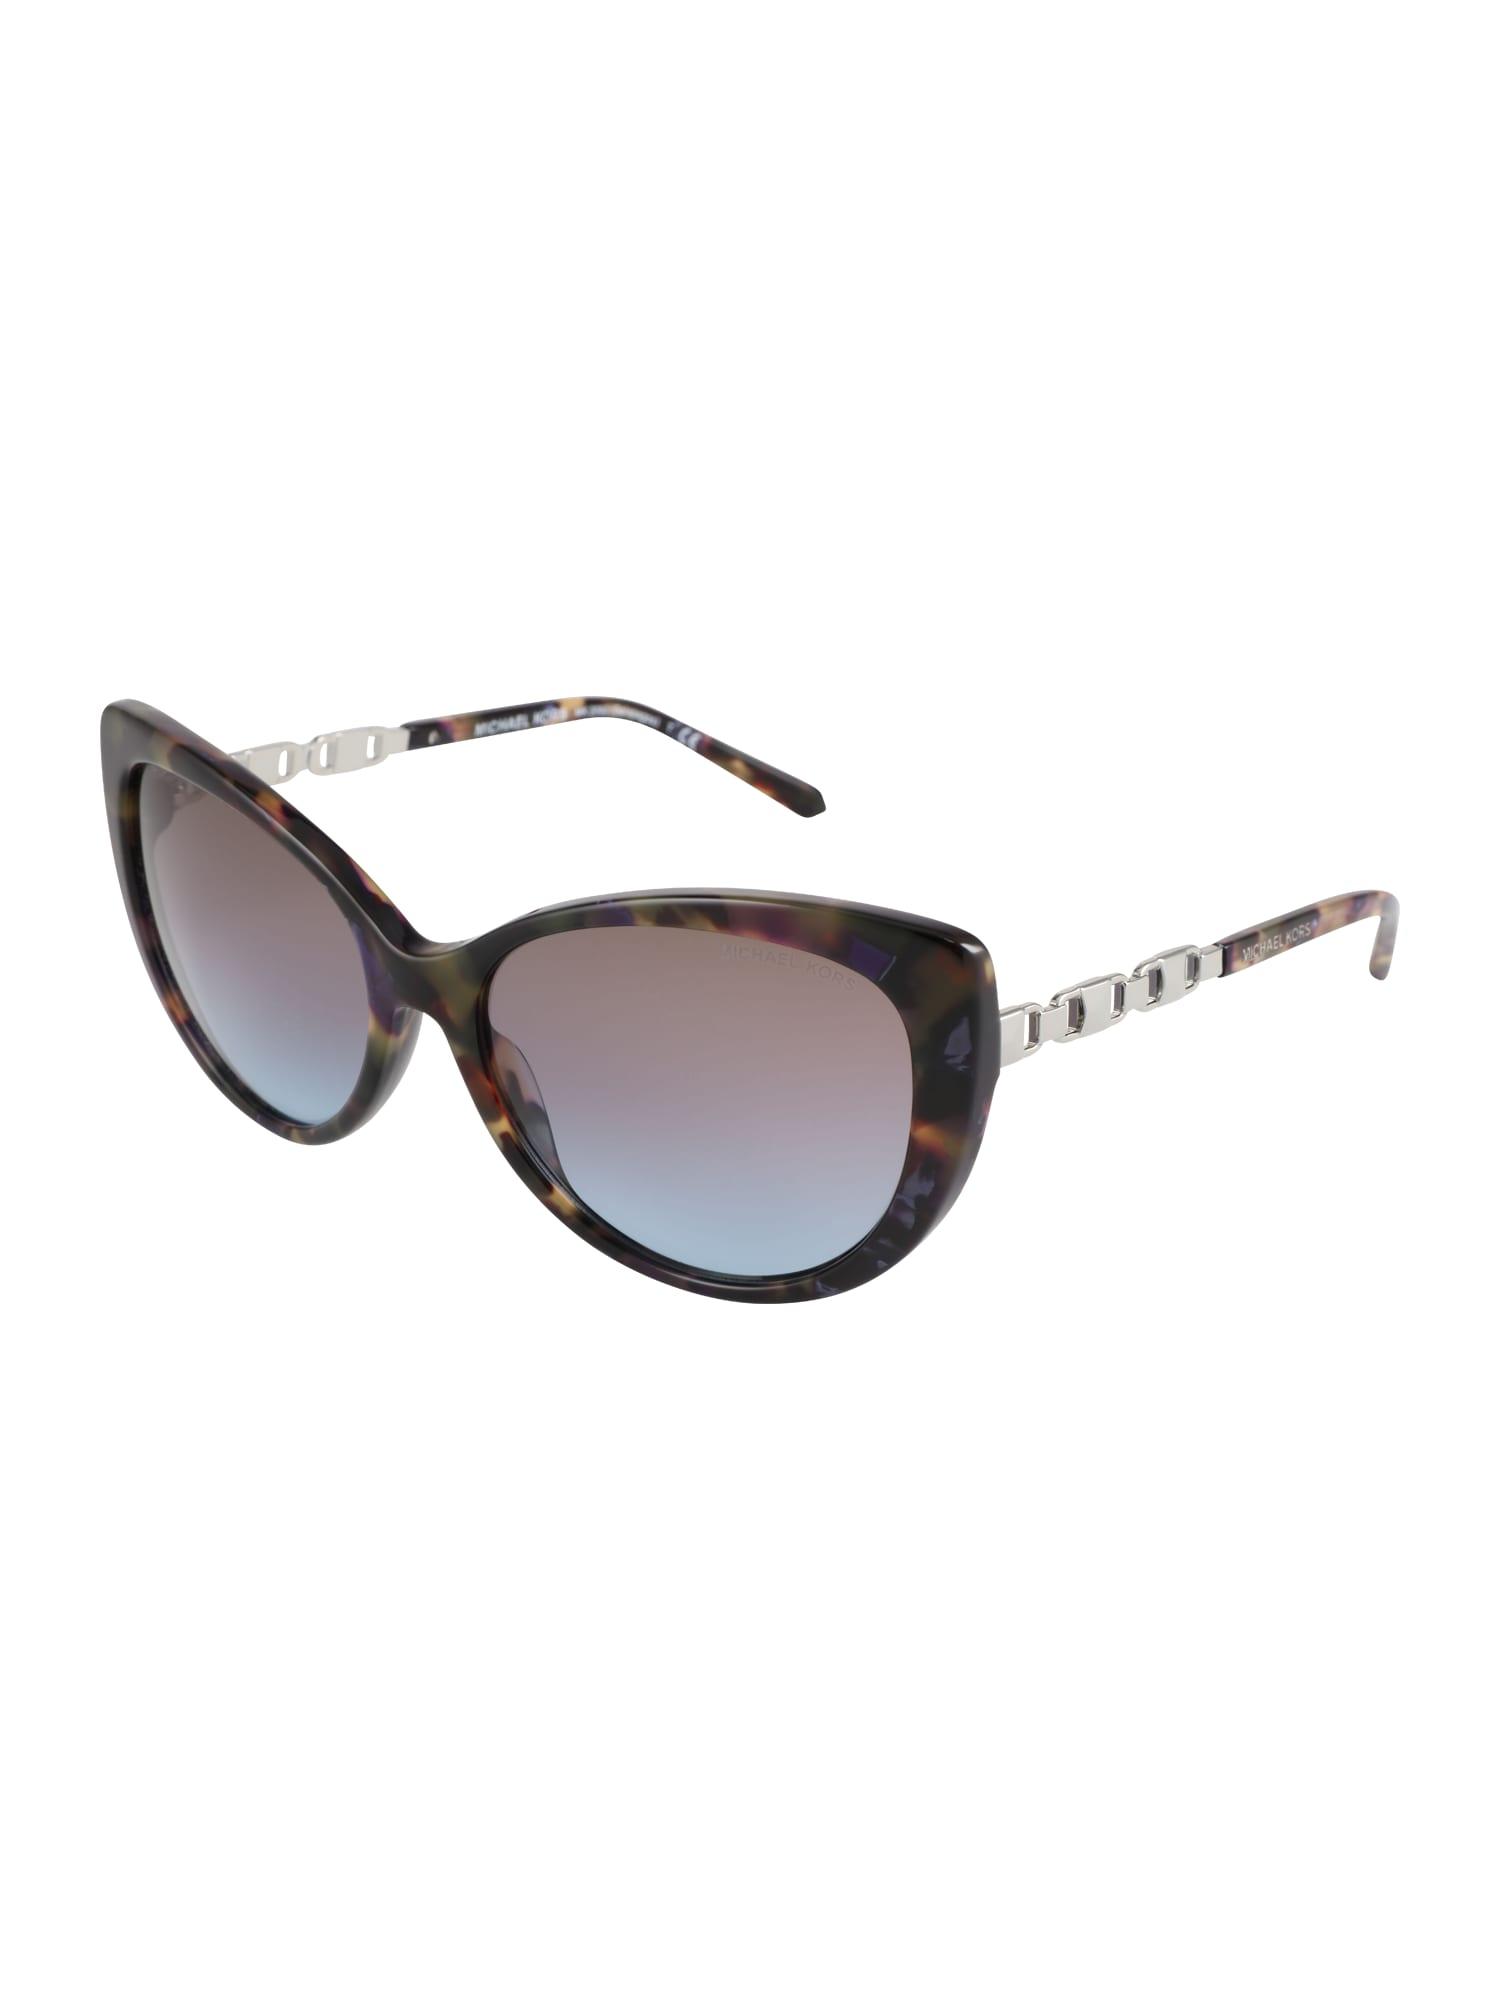 Sluneční brýle GALAPAGOS modrá Michael Kors